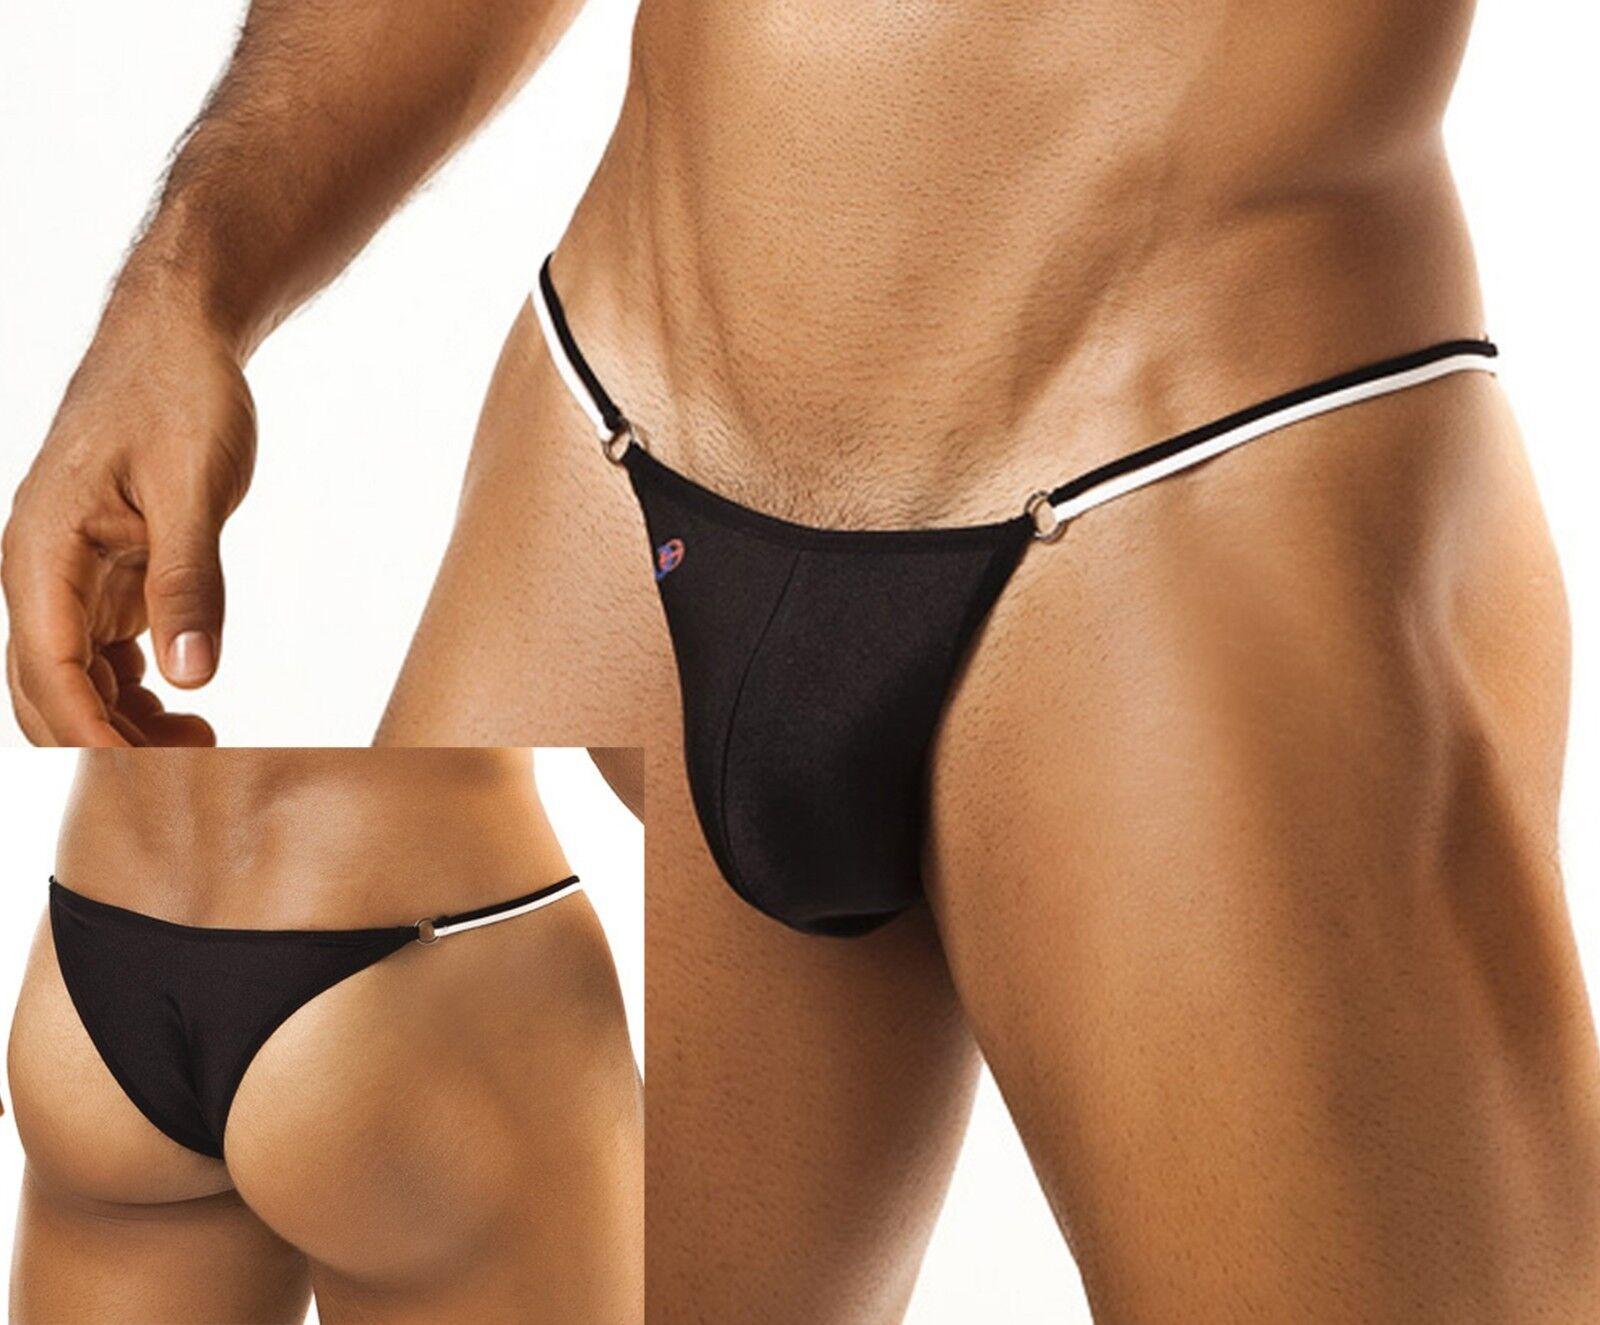 JOE SNYDER Brasil Mini Tanga Thong   Bikini String Slip Badehose Micro Badetanga